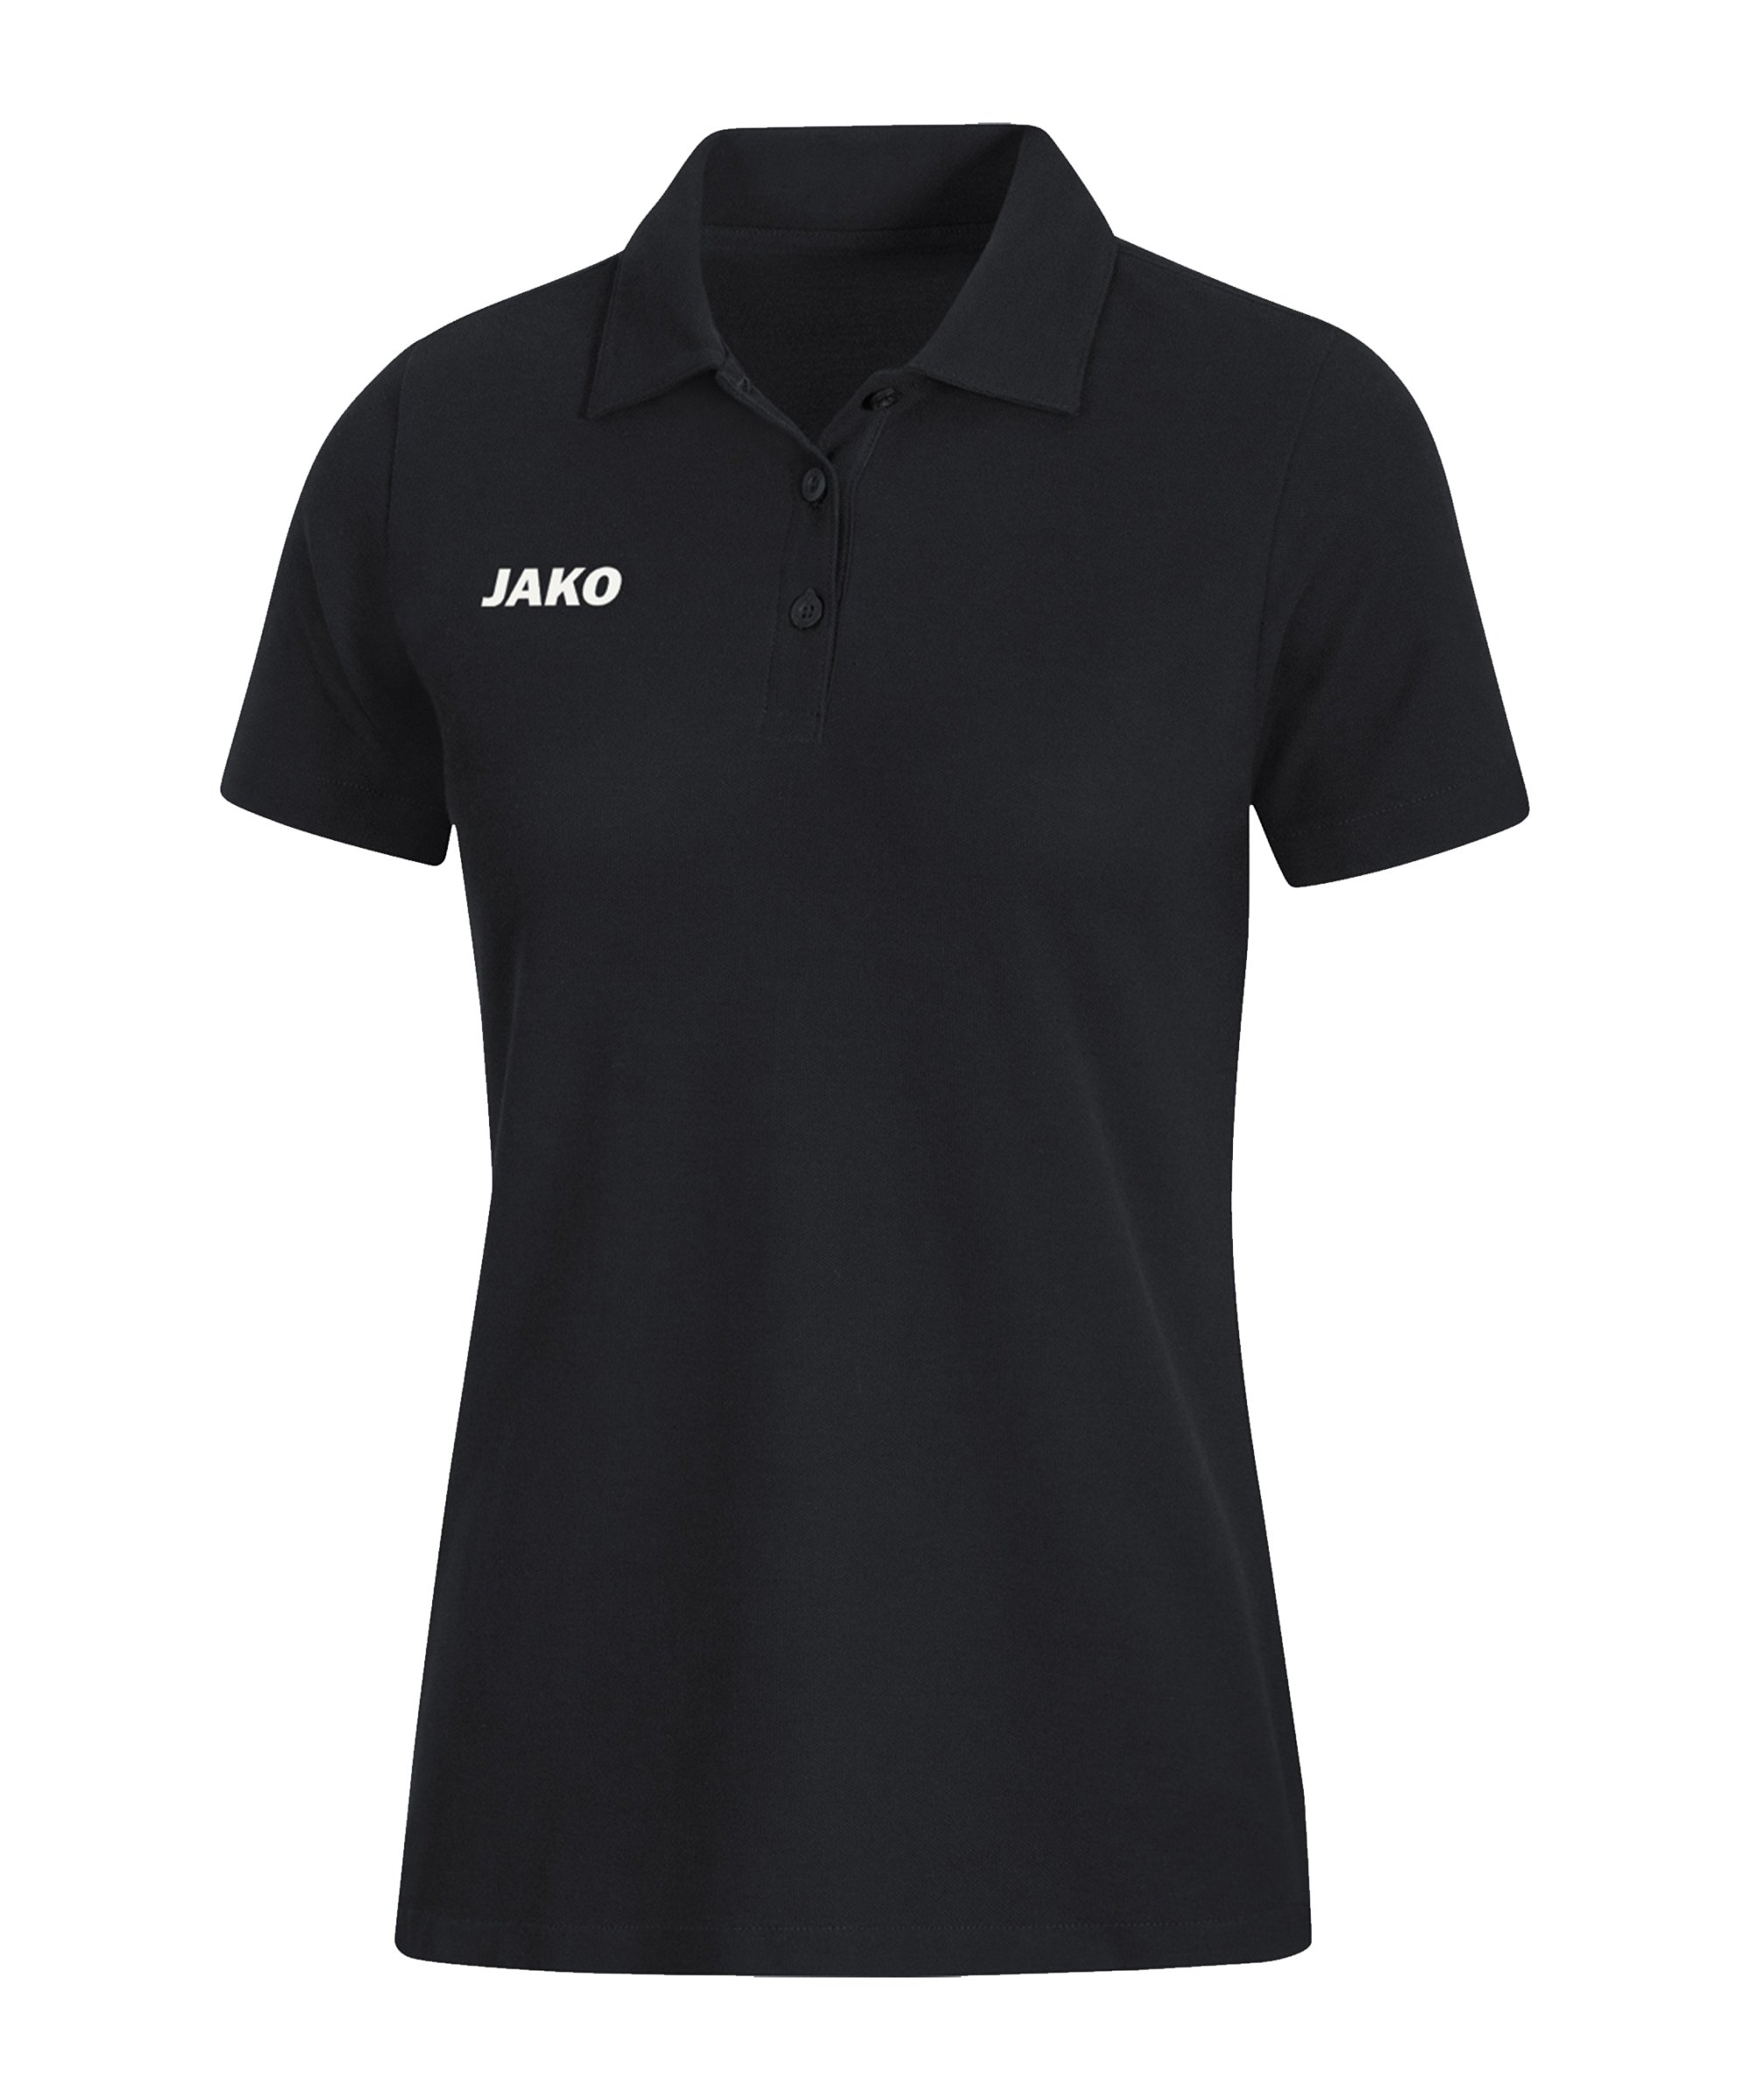 JAKO Base Poloshirt Damen Schwarz F08 - schwarz